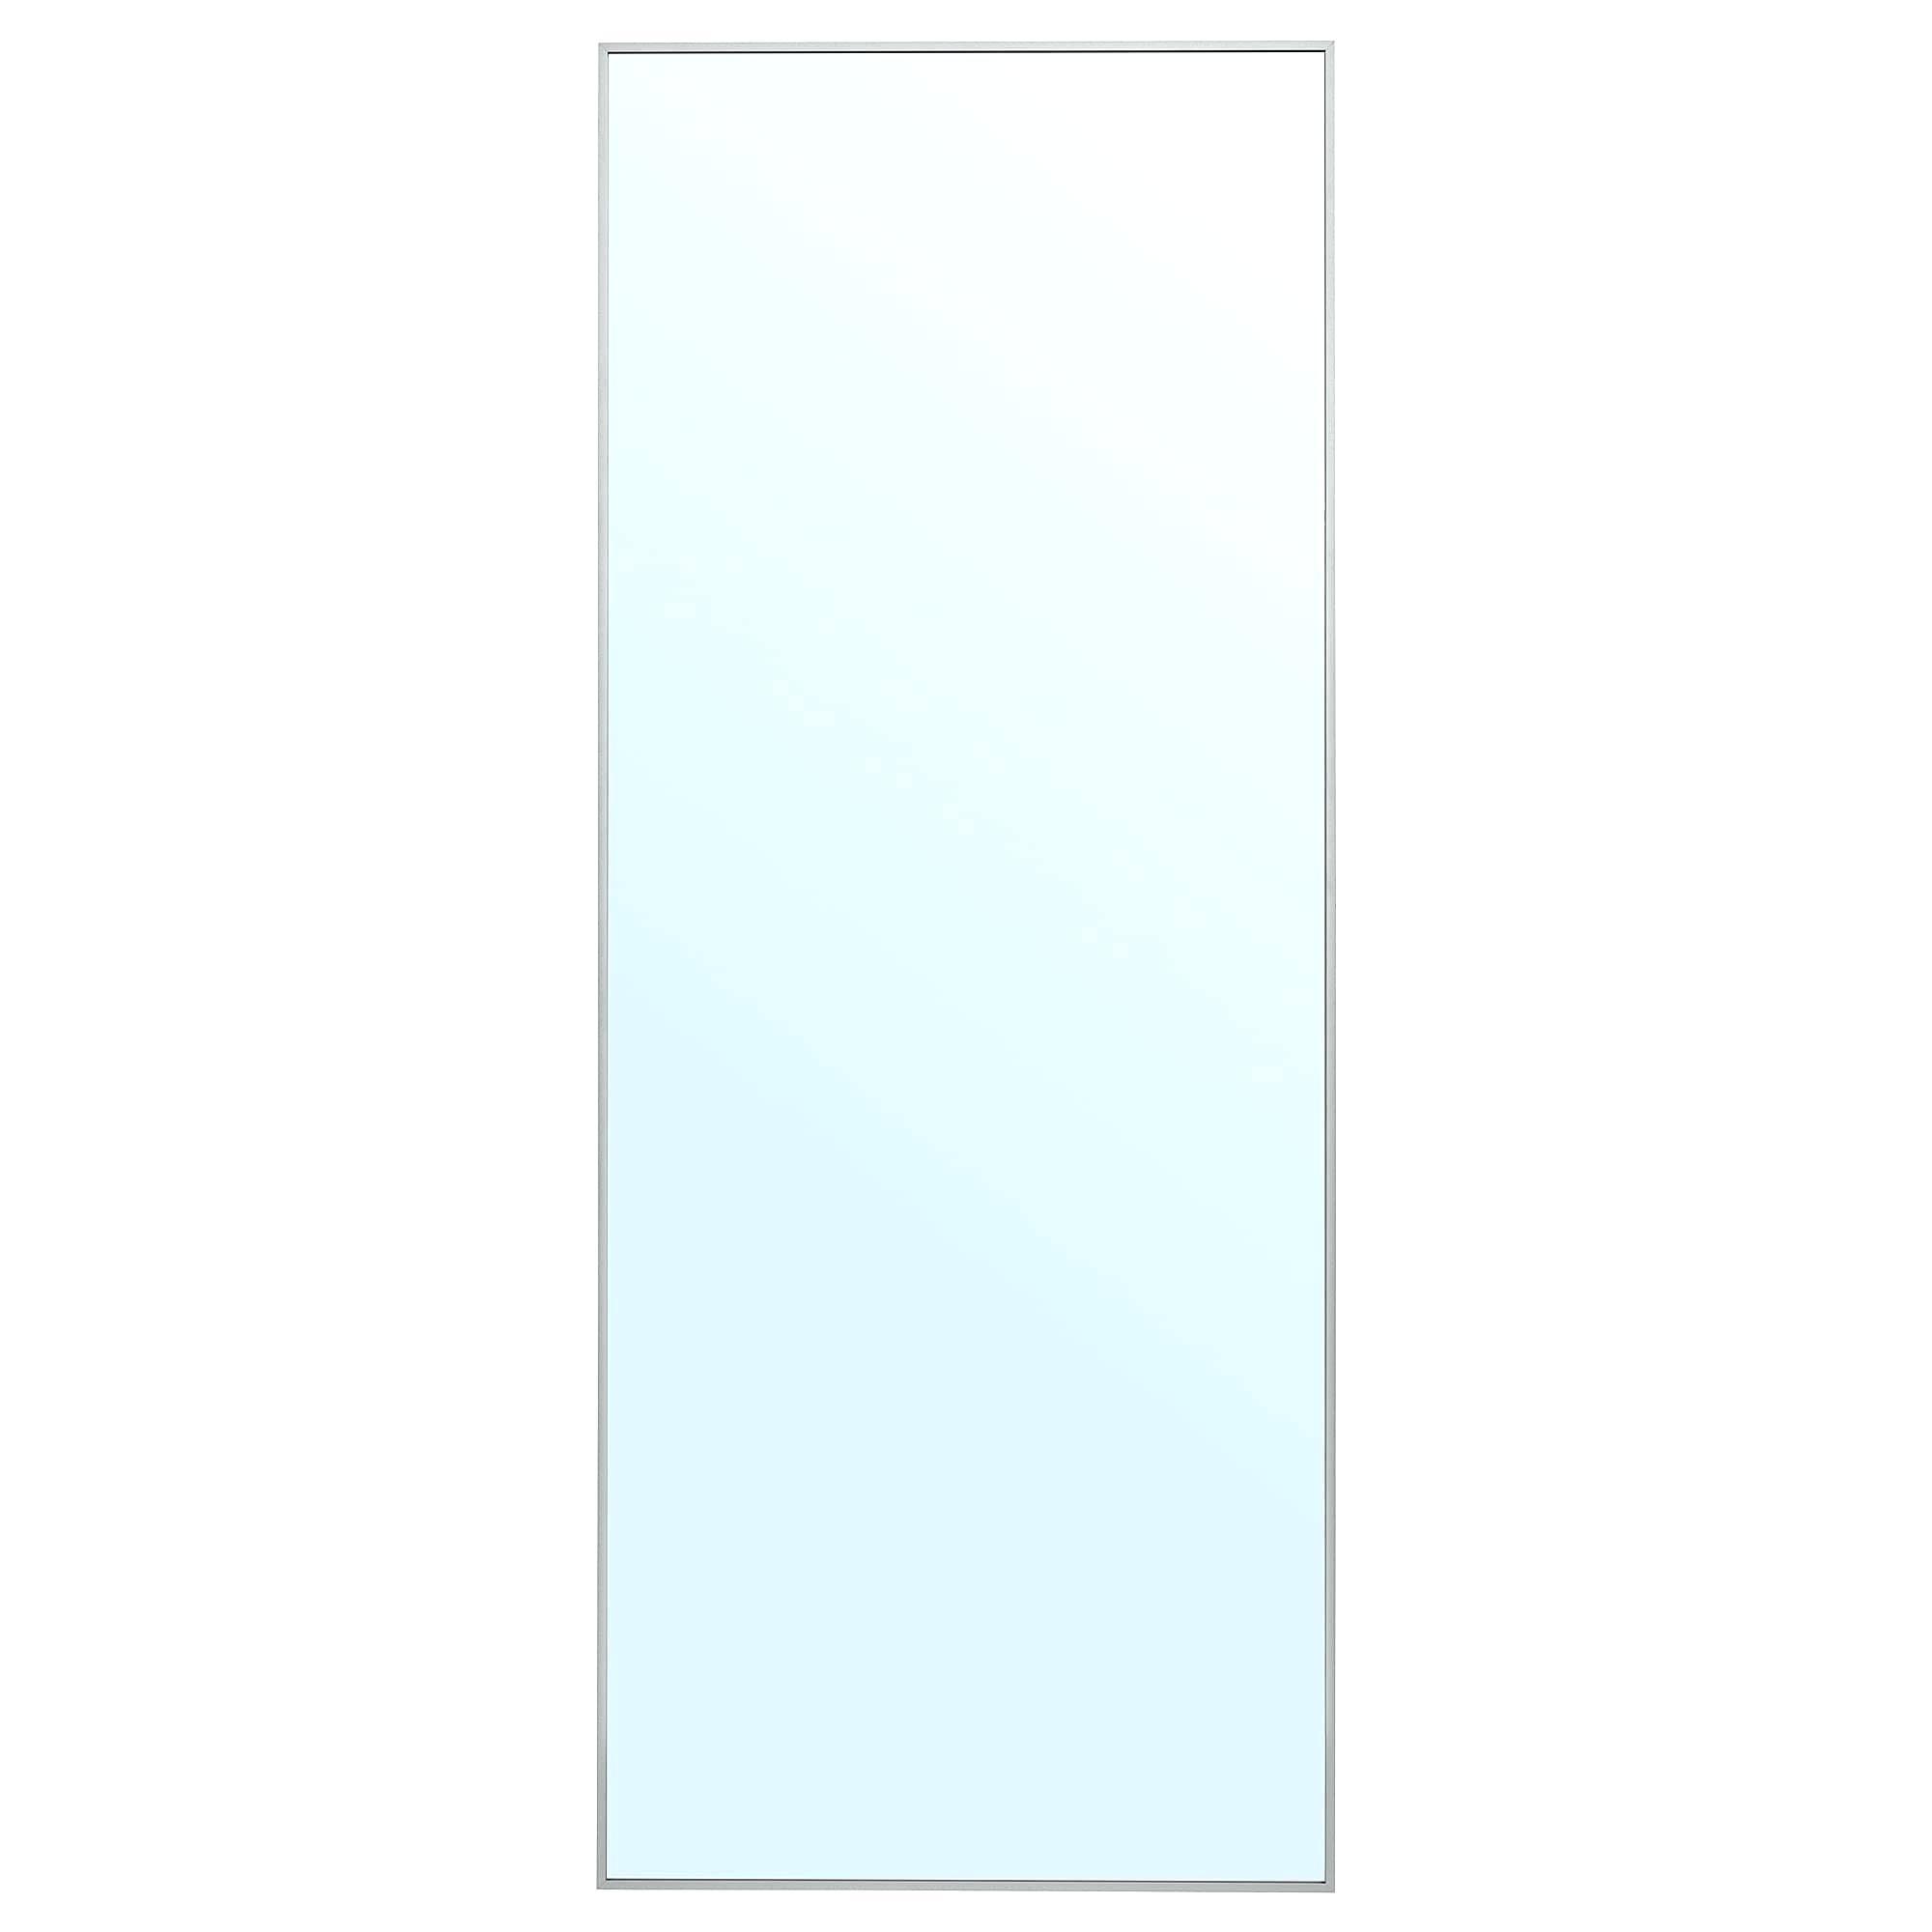 Huge Wall Mirrors Ikea Inside Most Popular Wall Mirror Ikea – Laurenfraser.co (Gallery 18 of 20)